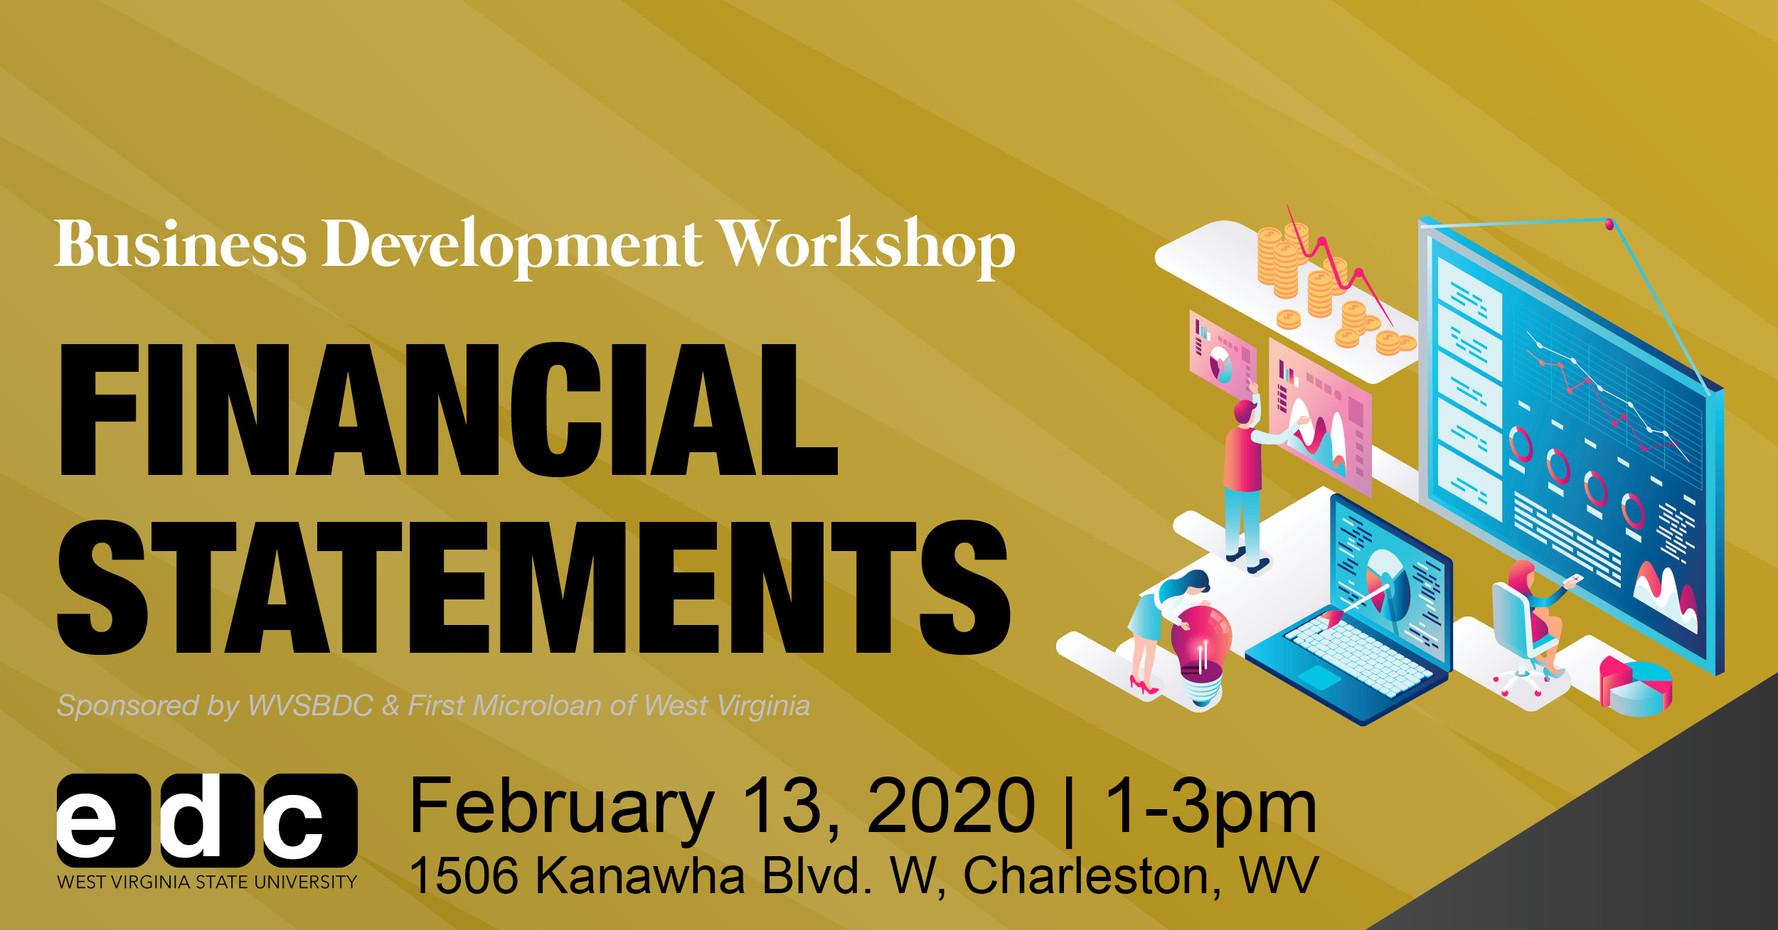 FinancialStatements_EDC_FB 2-13.jpg